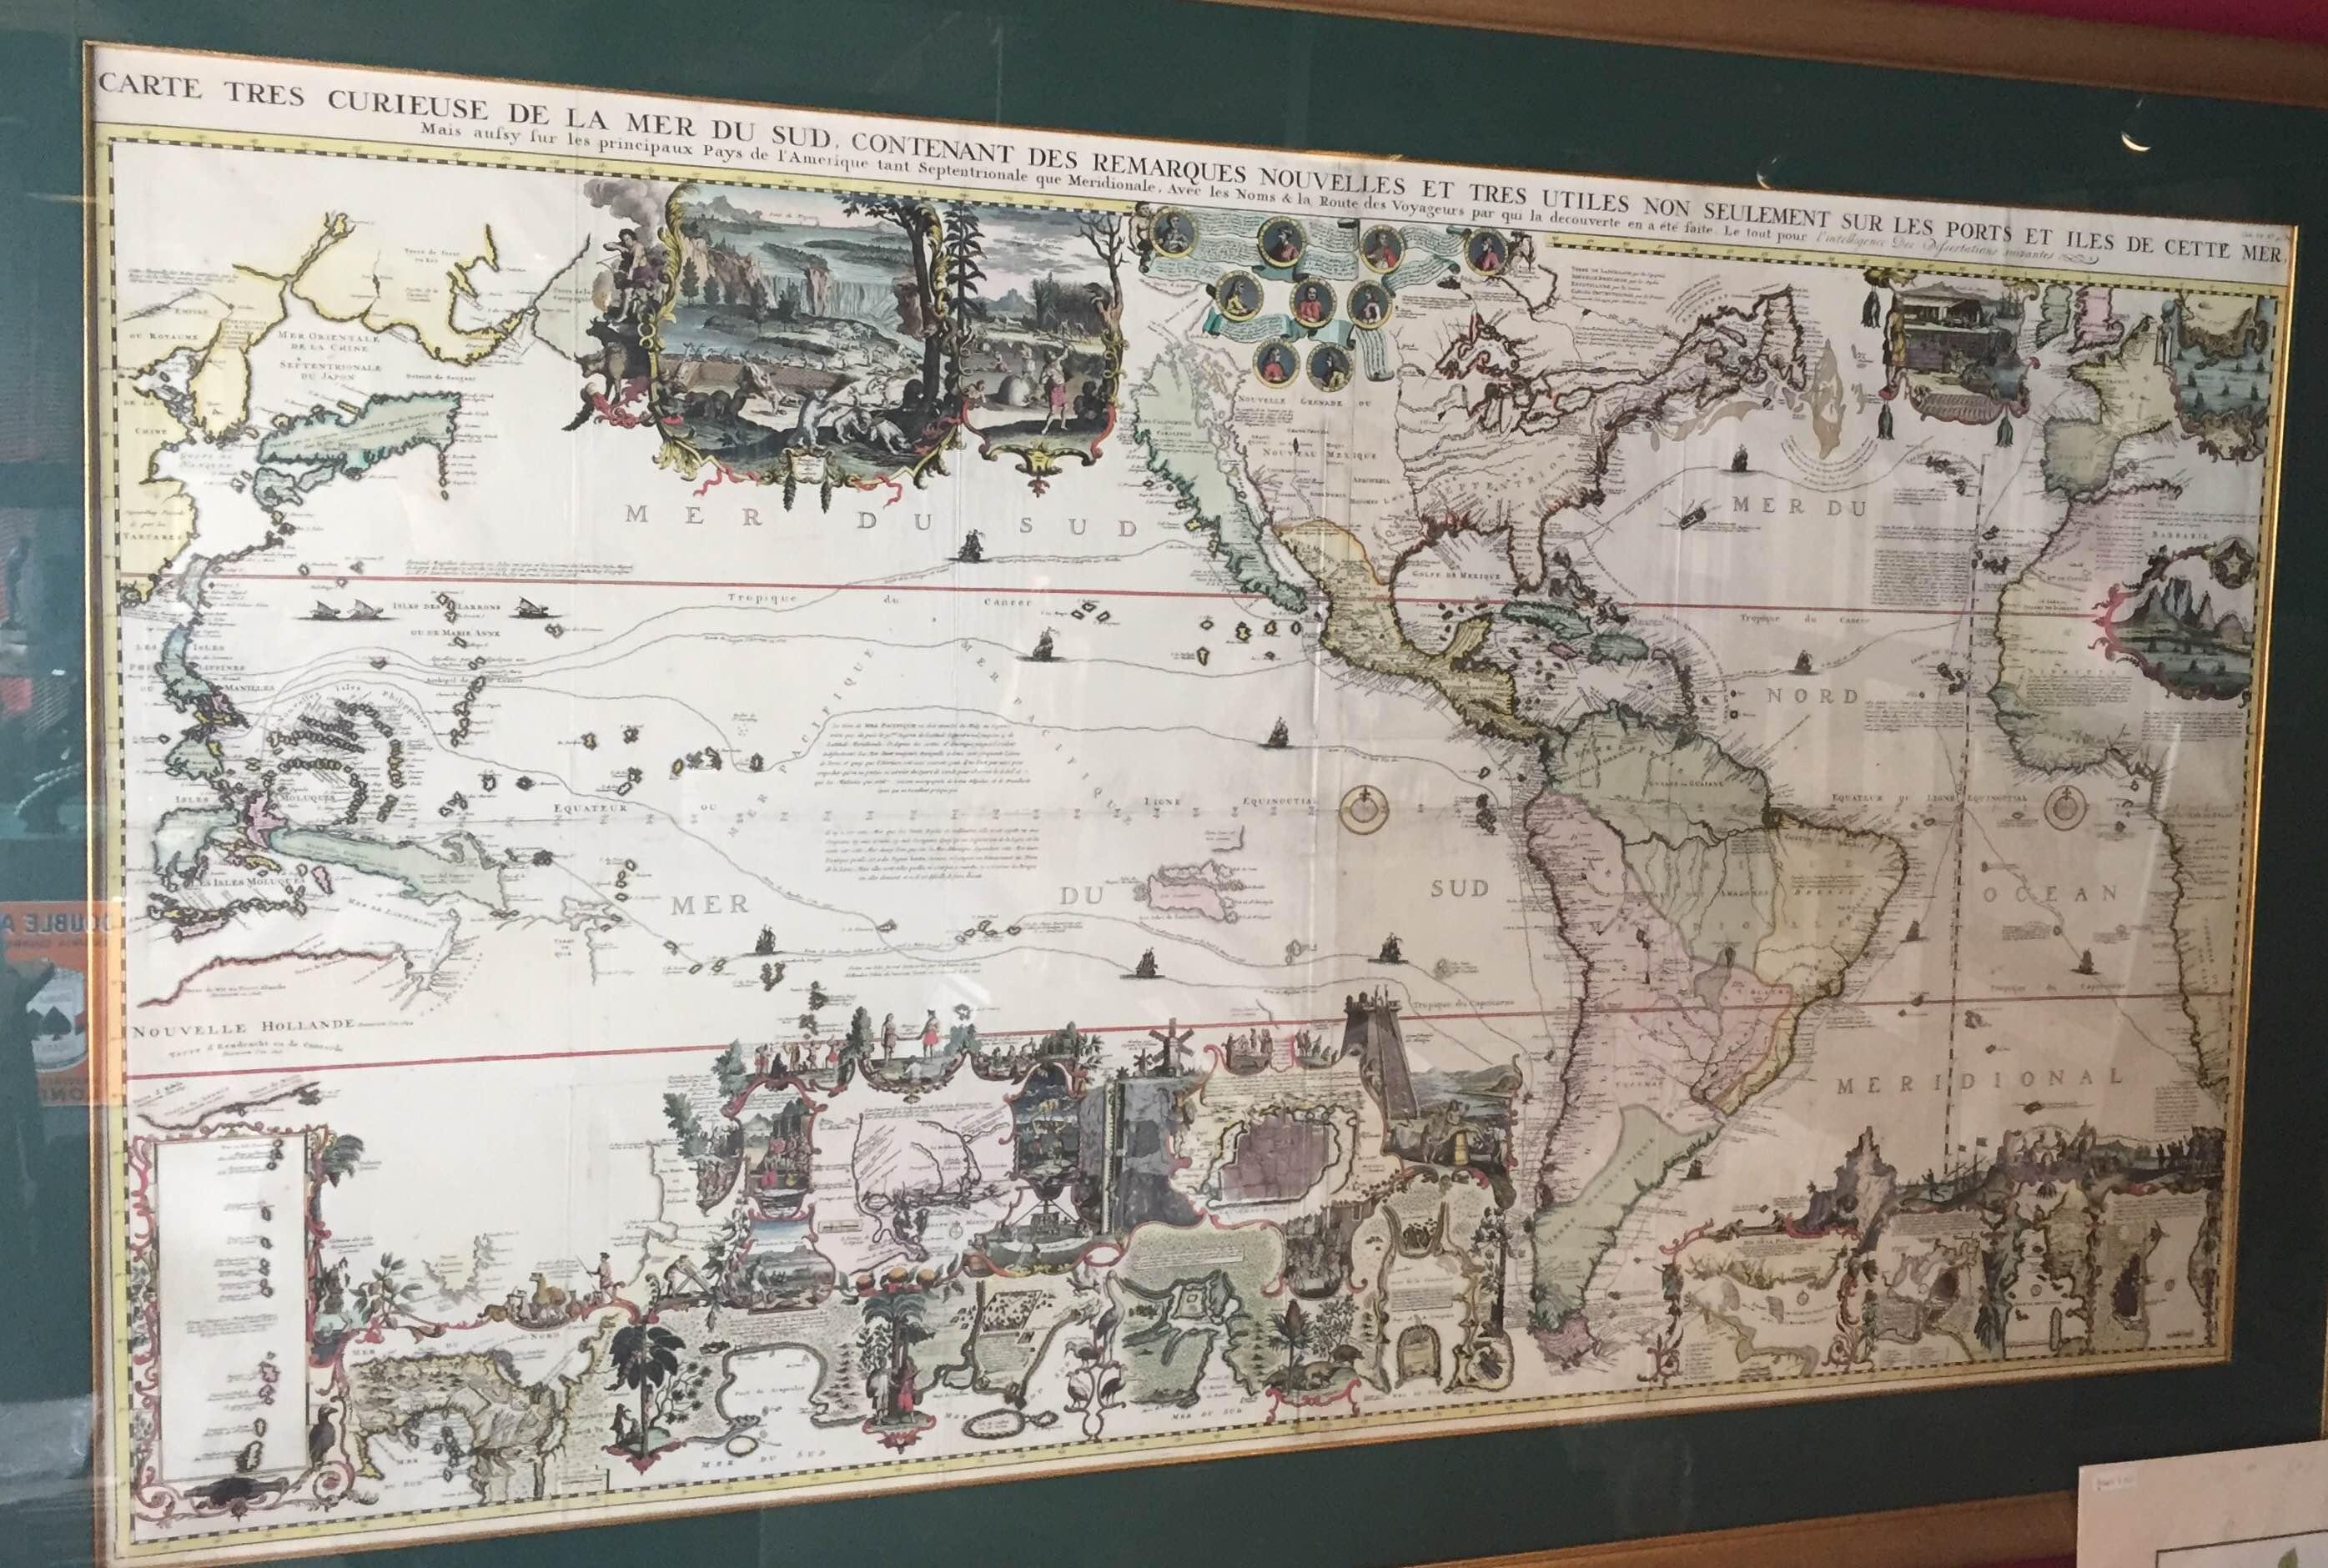 Antique world map by hatelain 1719 bartele gallerybartele gallery antique world map gumiabroncs Gallery